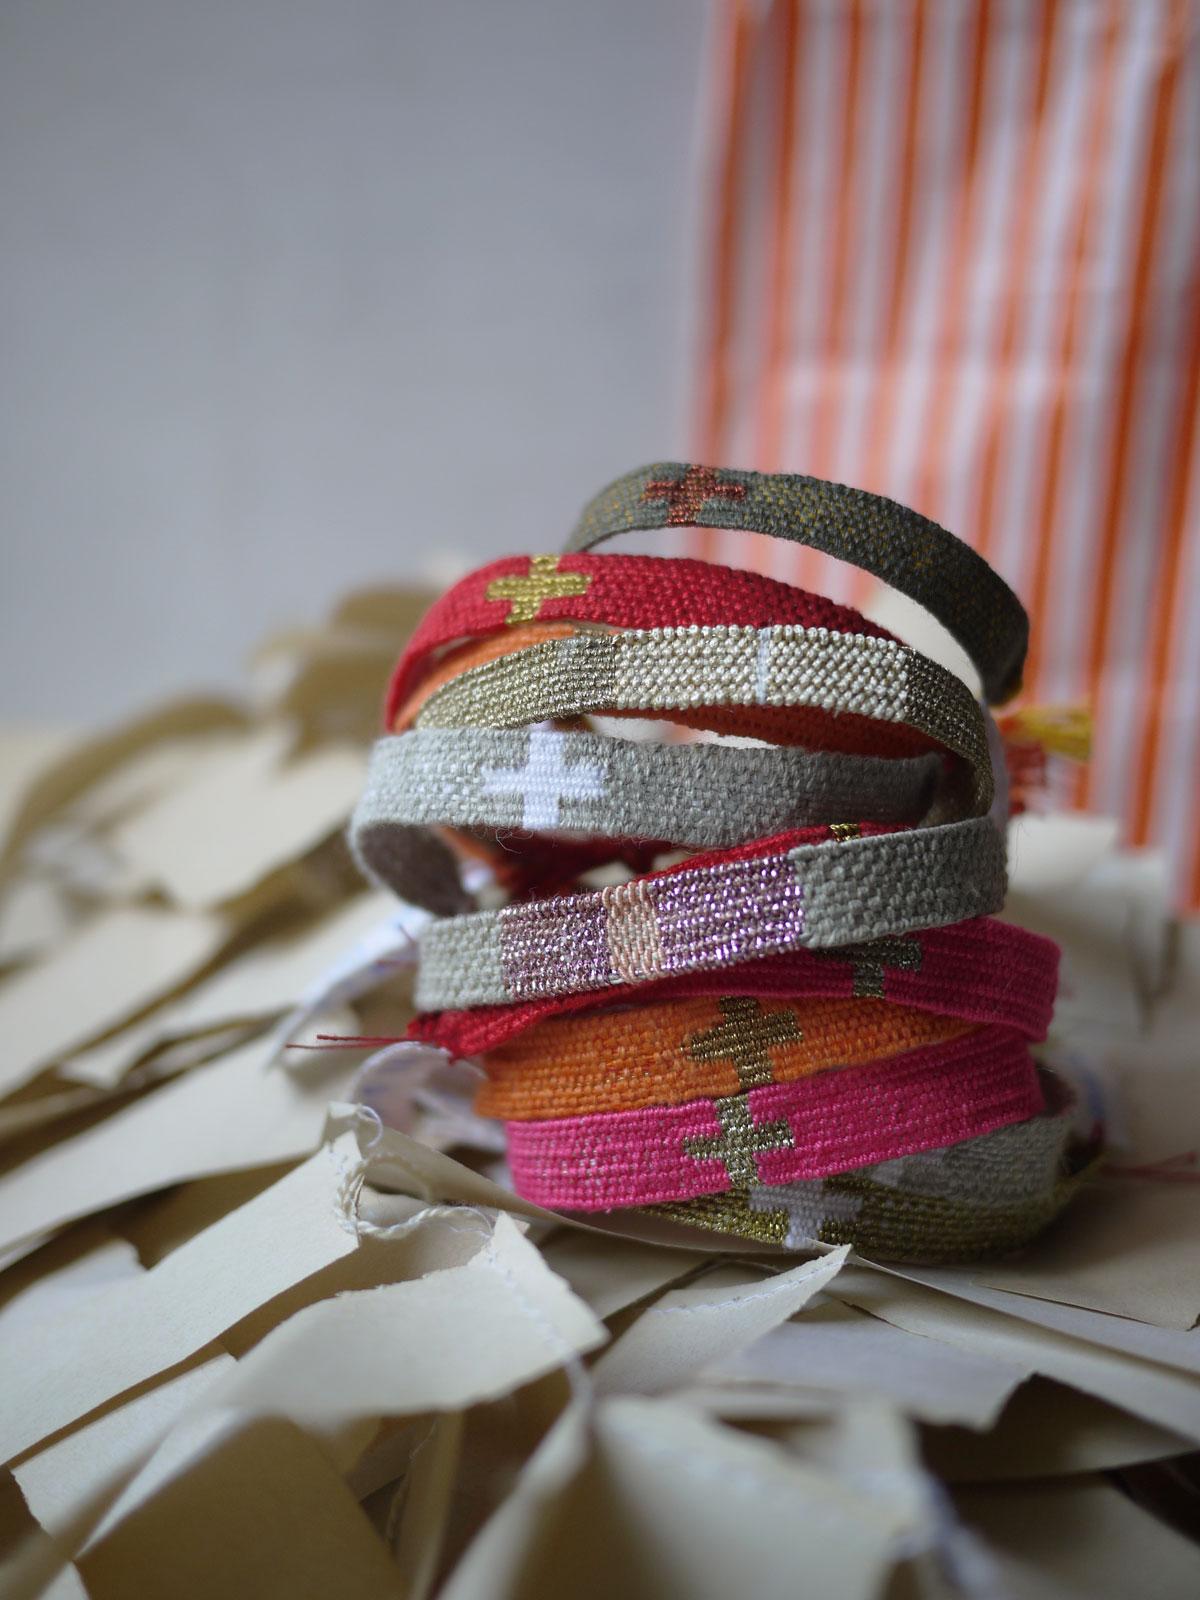 Bracelets LOOM - Design textile by Myriam Balaÿ myriam-balay-lundi2 FRENCH STYLE L'appartement